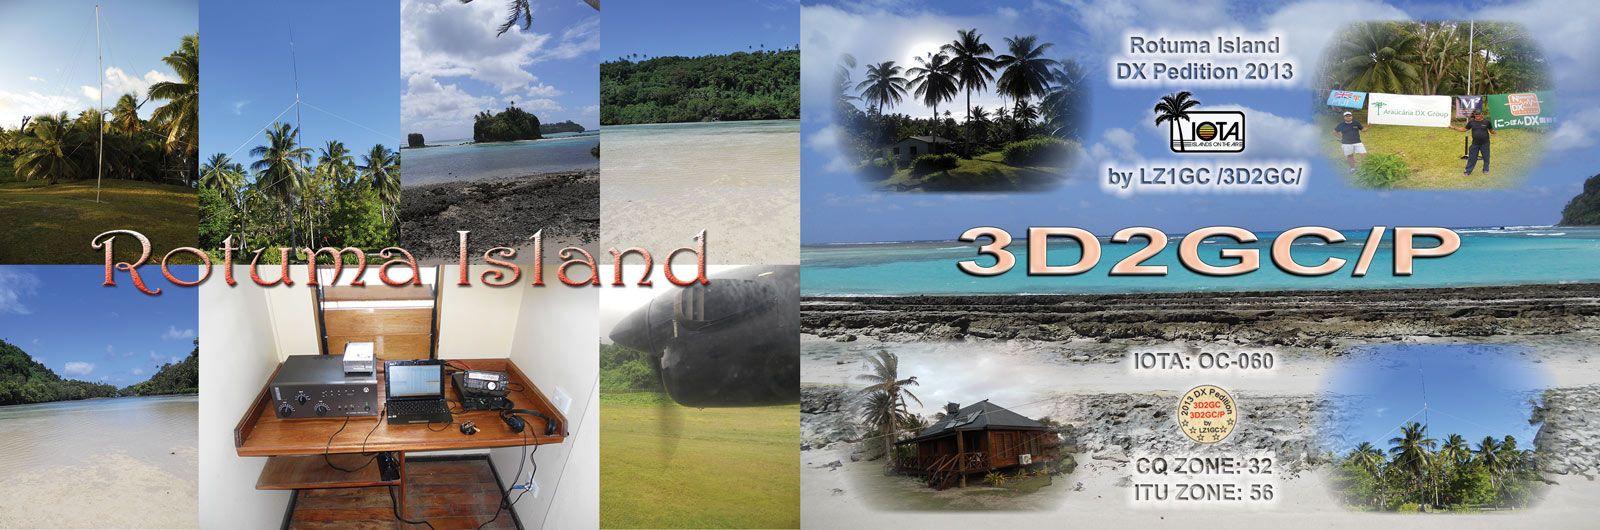 Rotuma Island 3D2GC/P